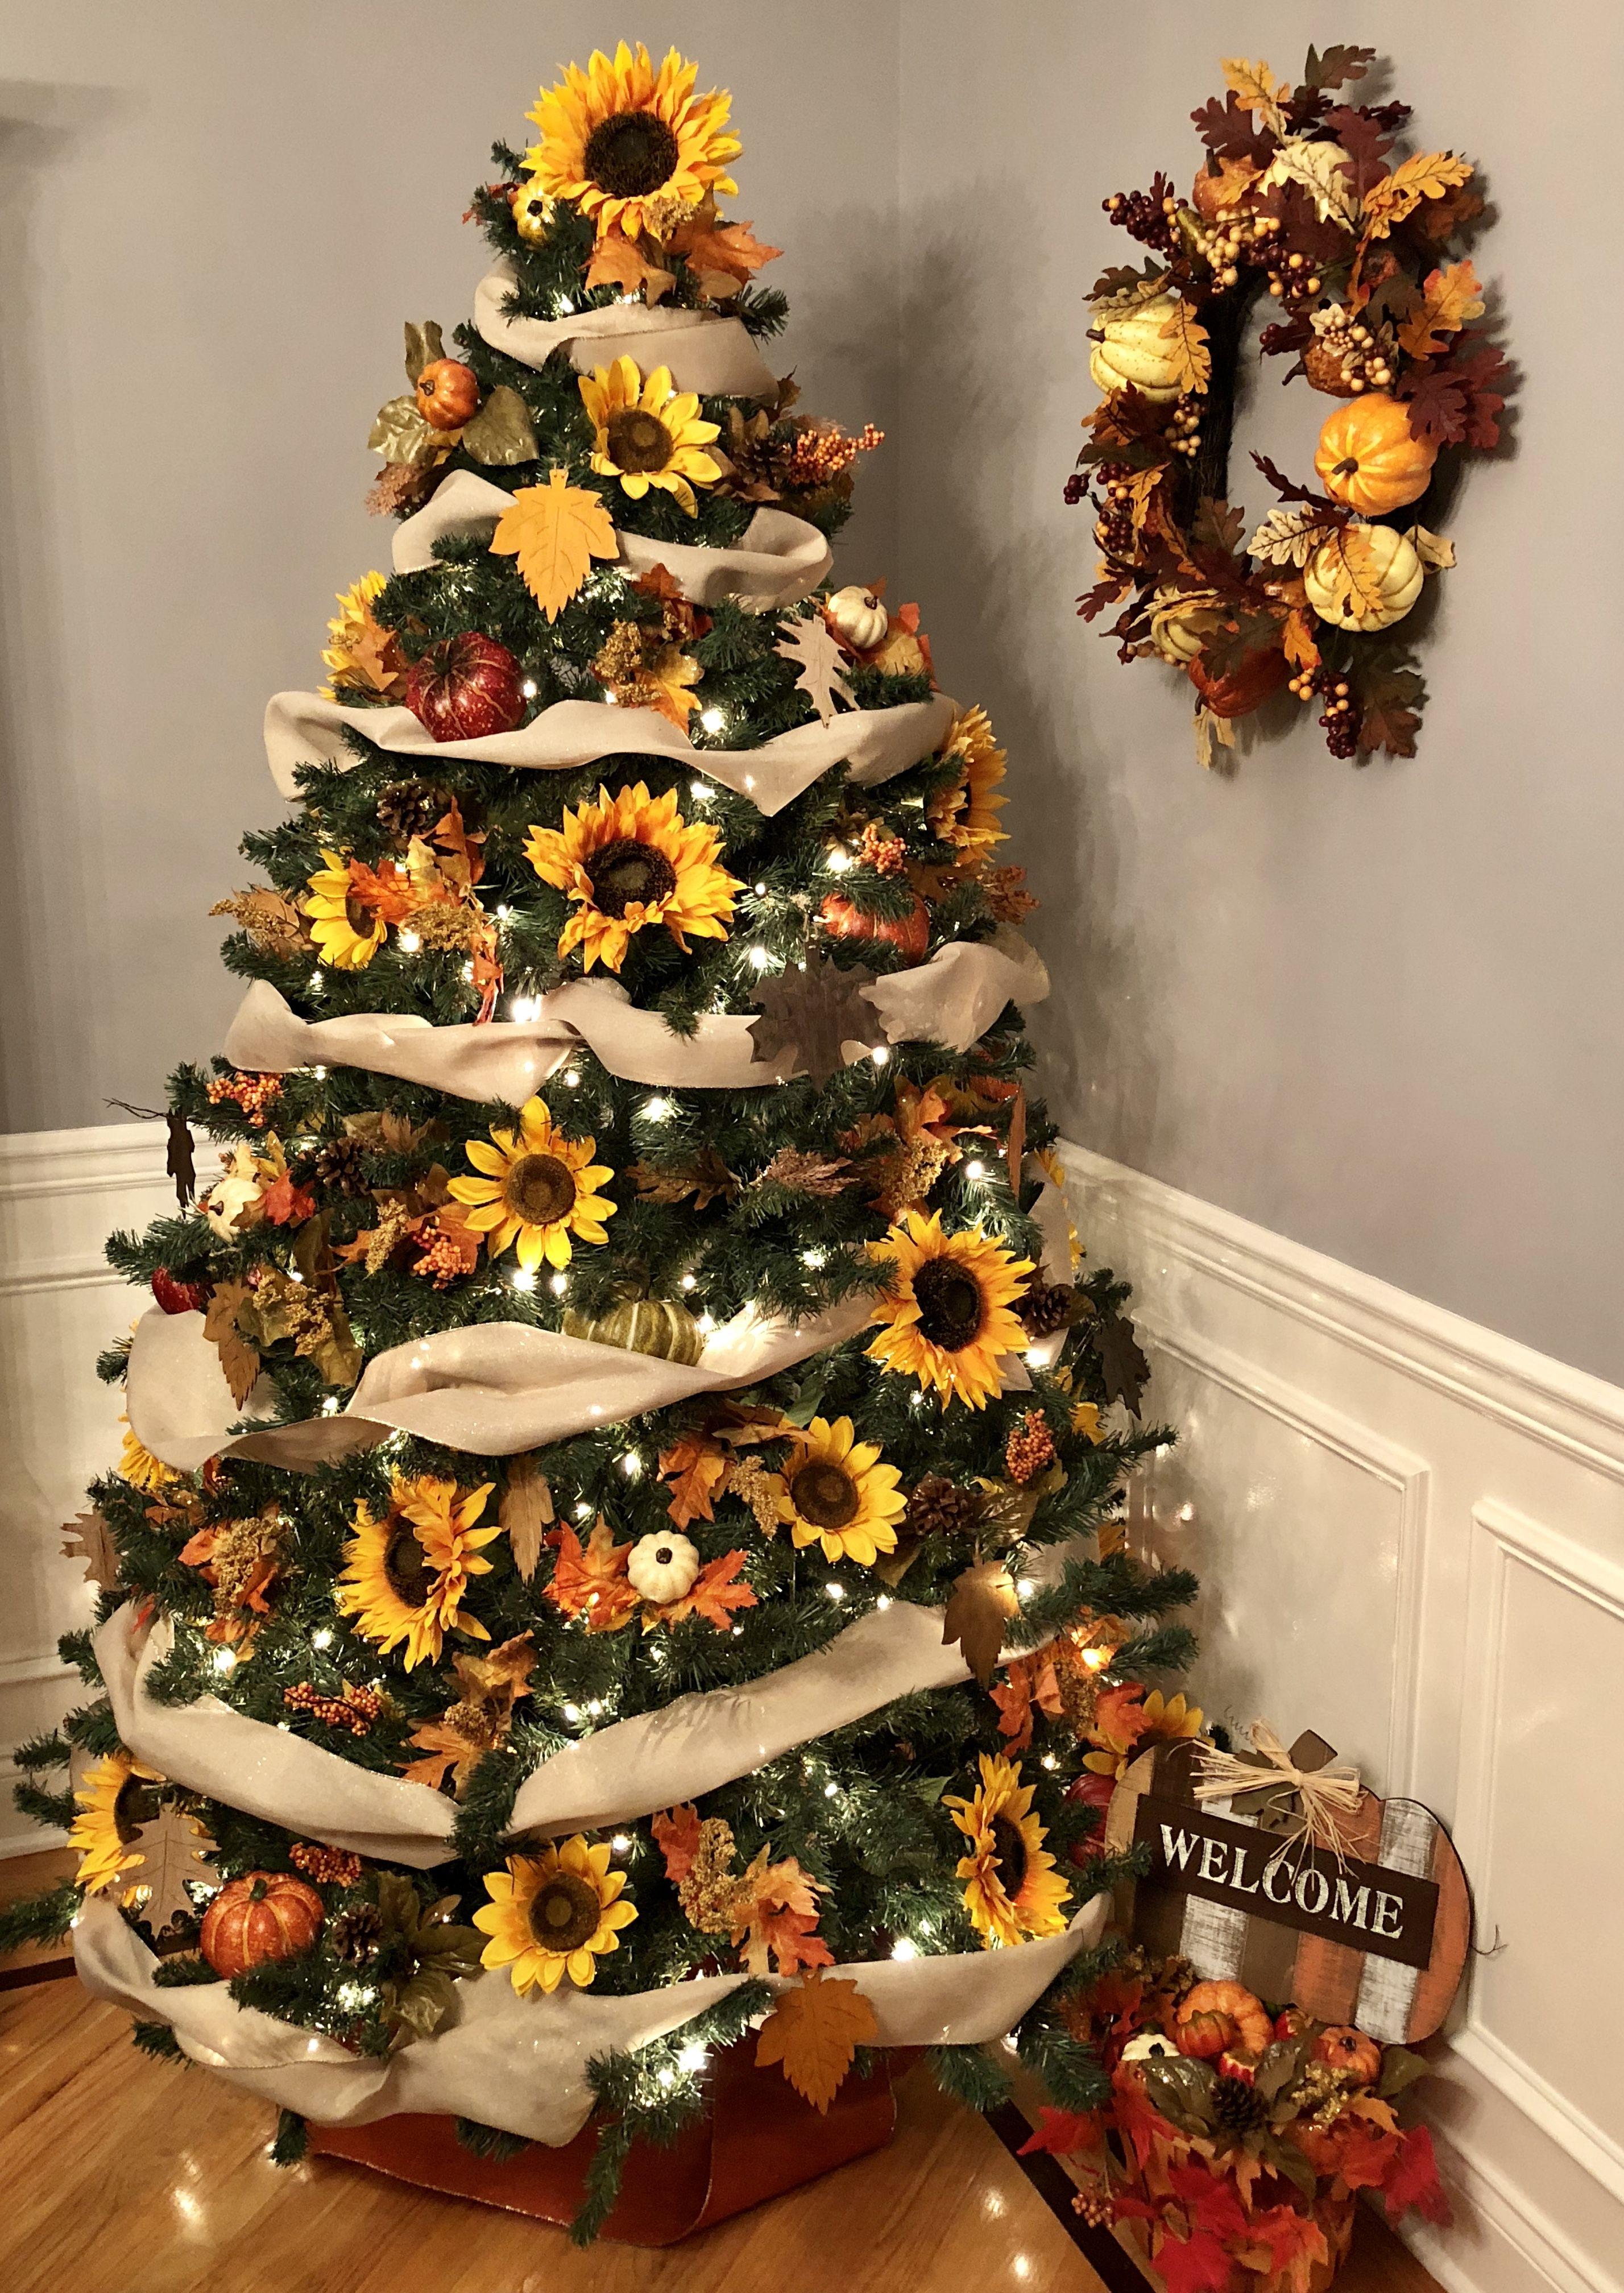 Fall Christmas Tree Fall Christmas Tree Christmas Decorations Rustic Tree Rustic Christmas Tree